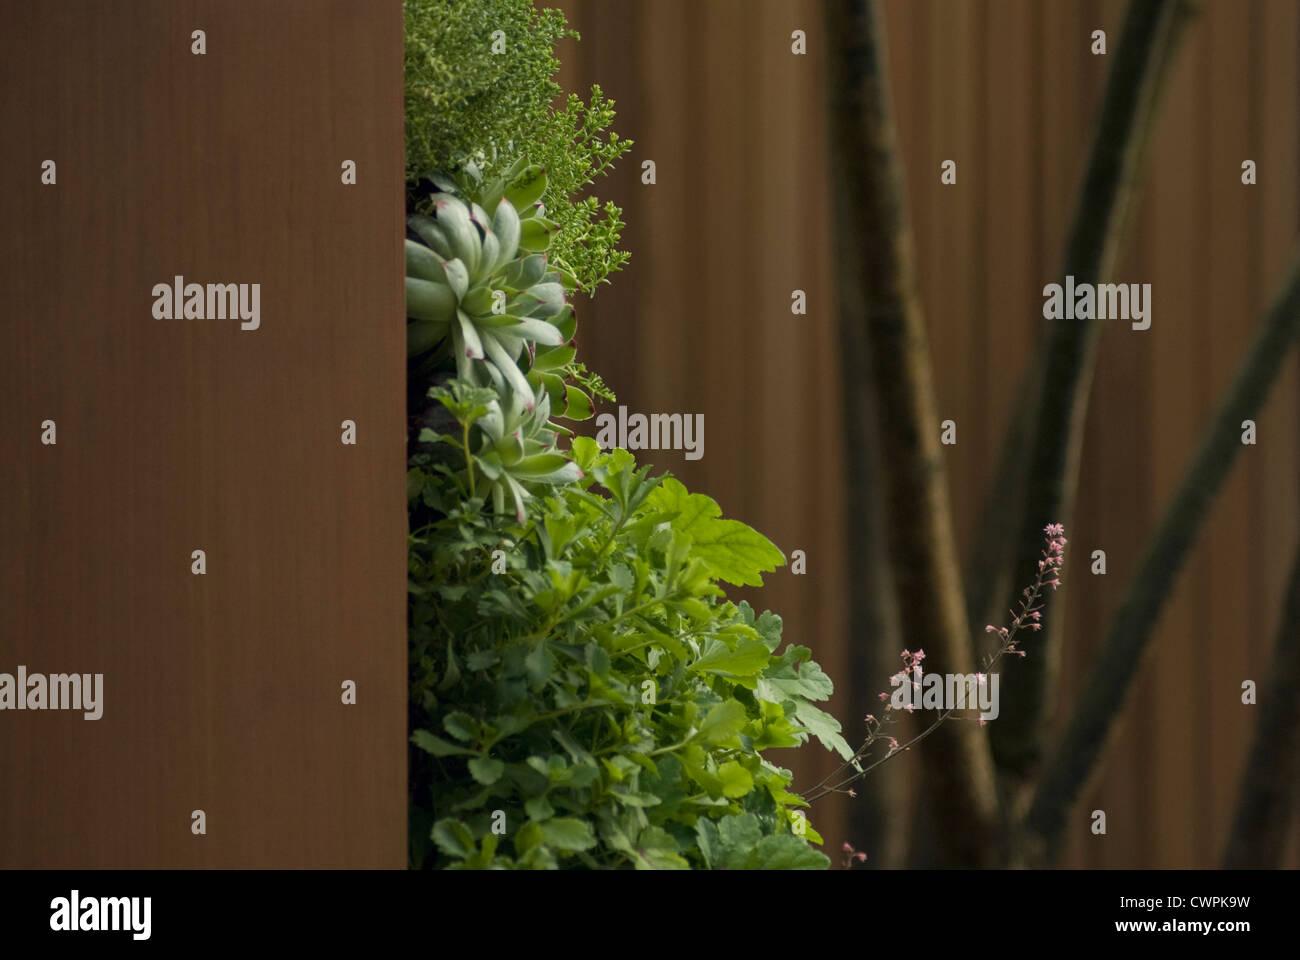 heuchera purpurgl ckchen stockfoto bild 50285253 alamy. Black Bedroom Furniture Sets. Home Design Ideas